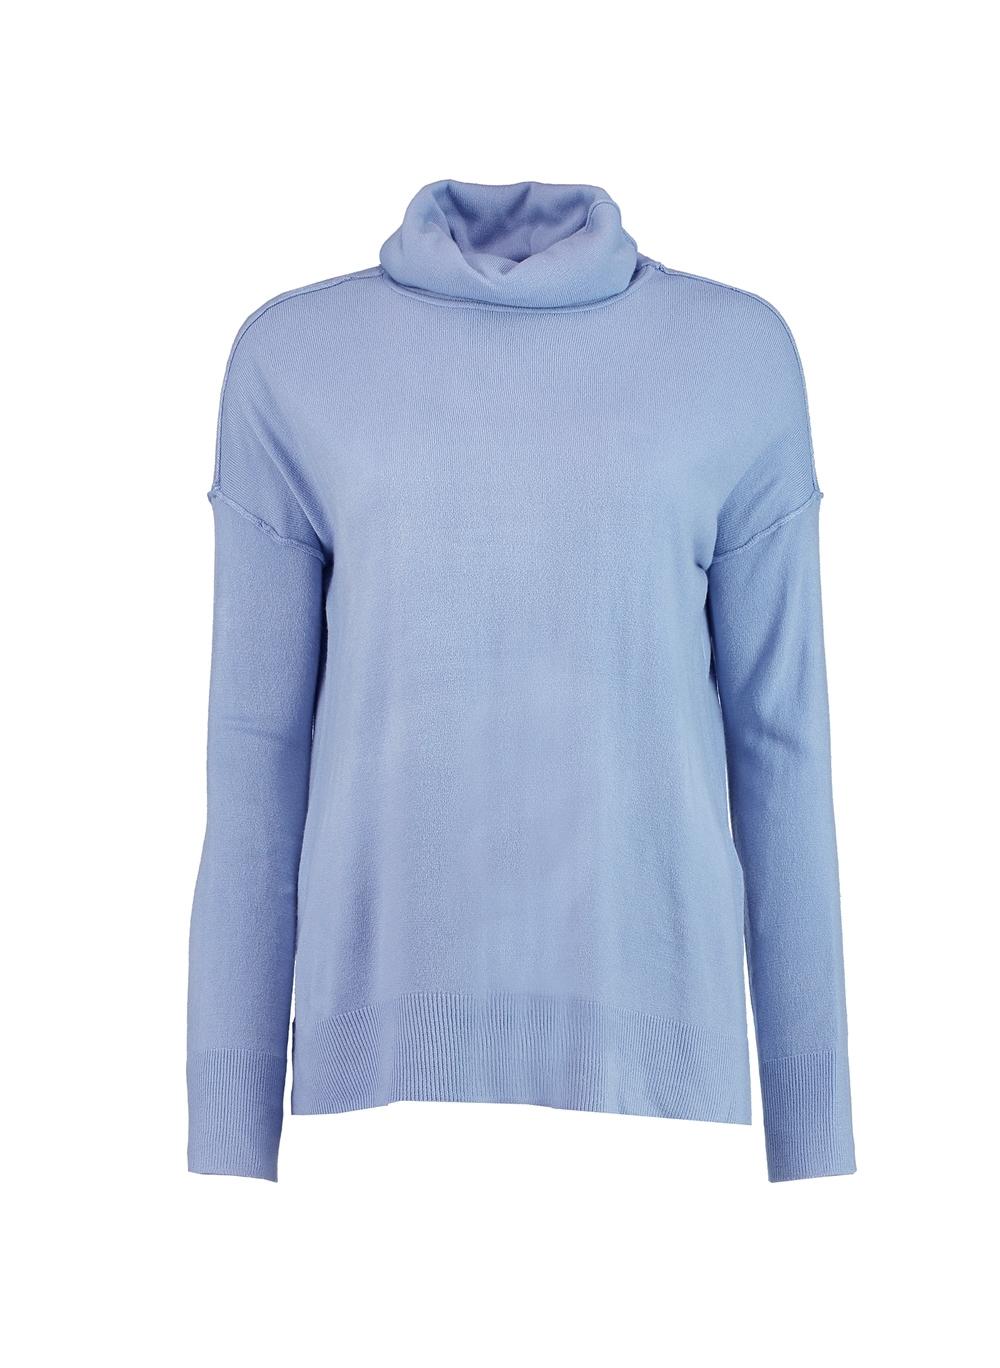 Blusa Le Lis Blanc Lis I Feminina (Azul Acizentado, M)